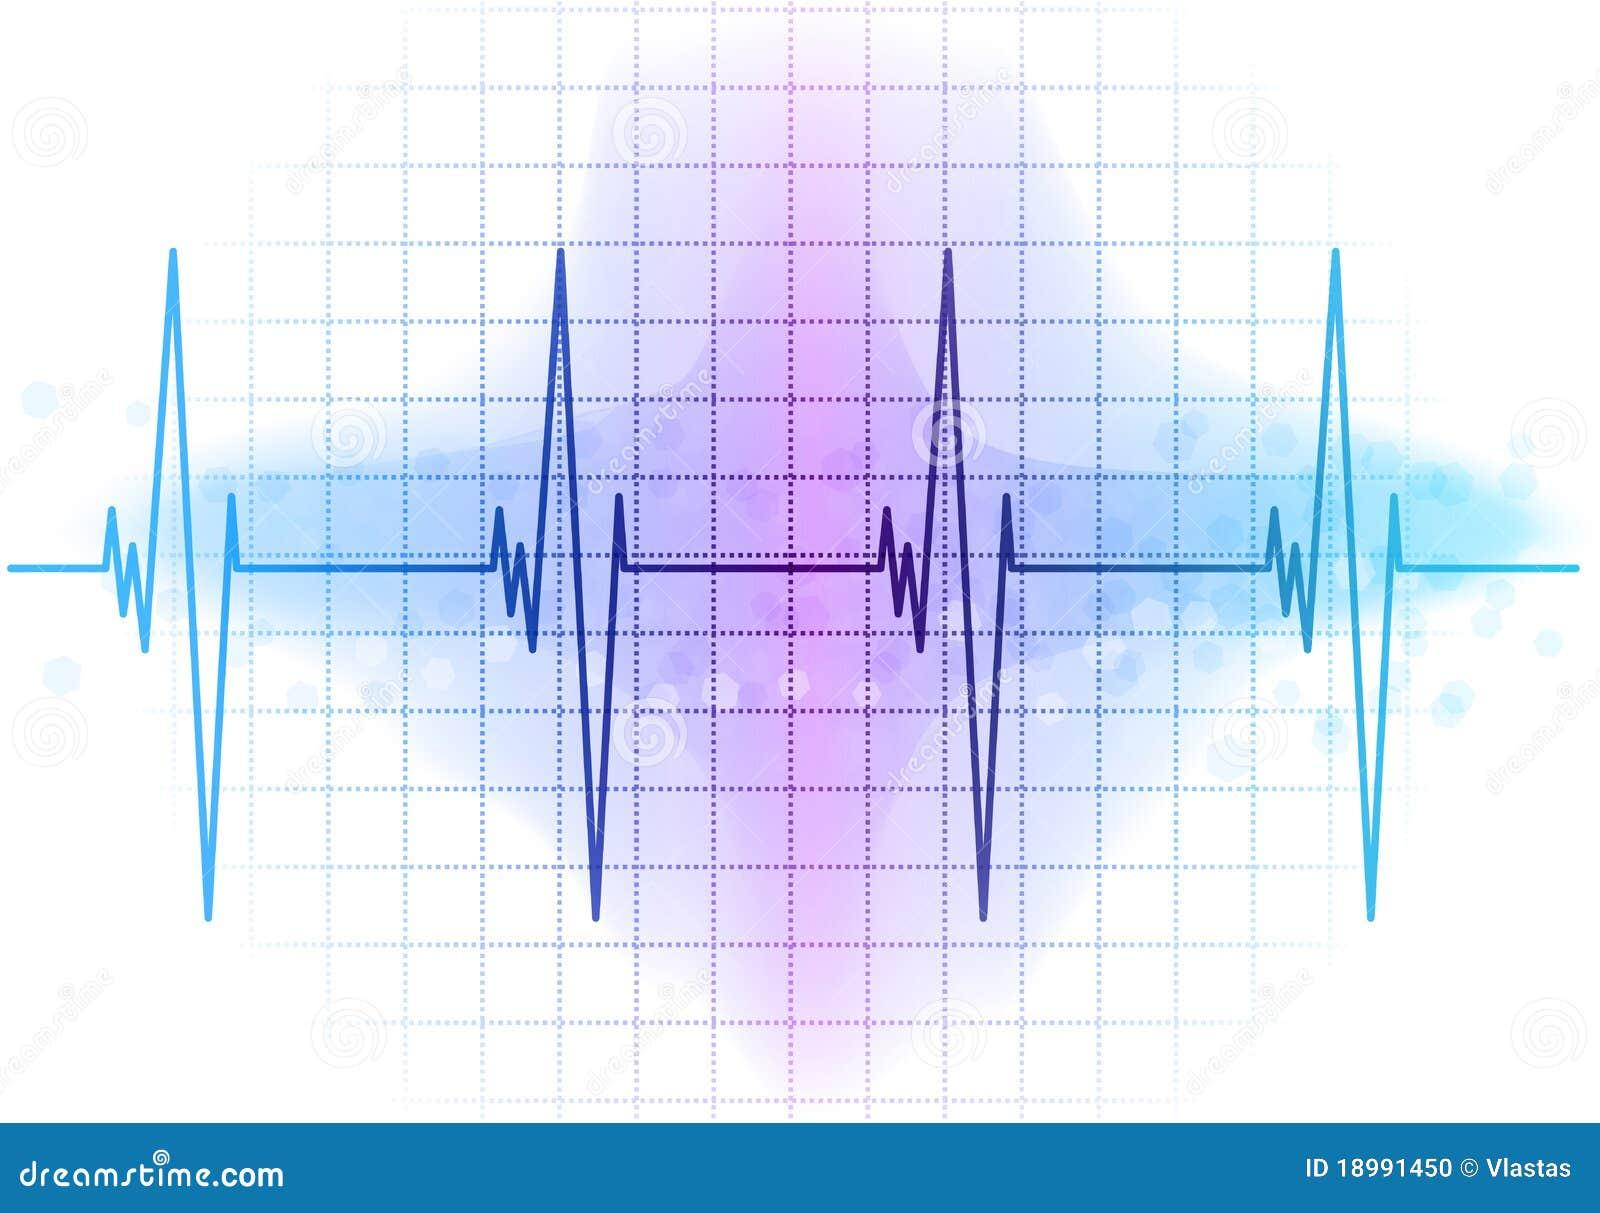 Ekg Diagram Stock Vector  Image Of Healthcare  Cardiogram